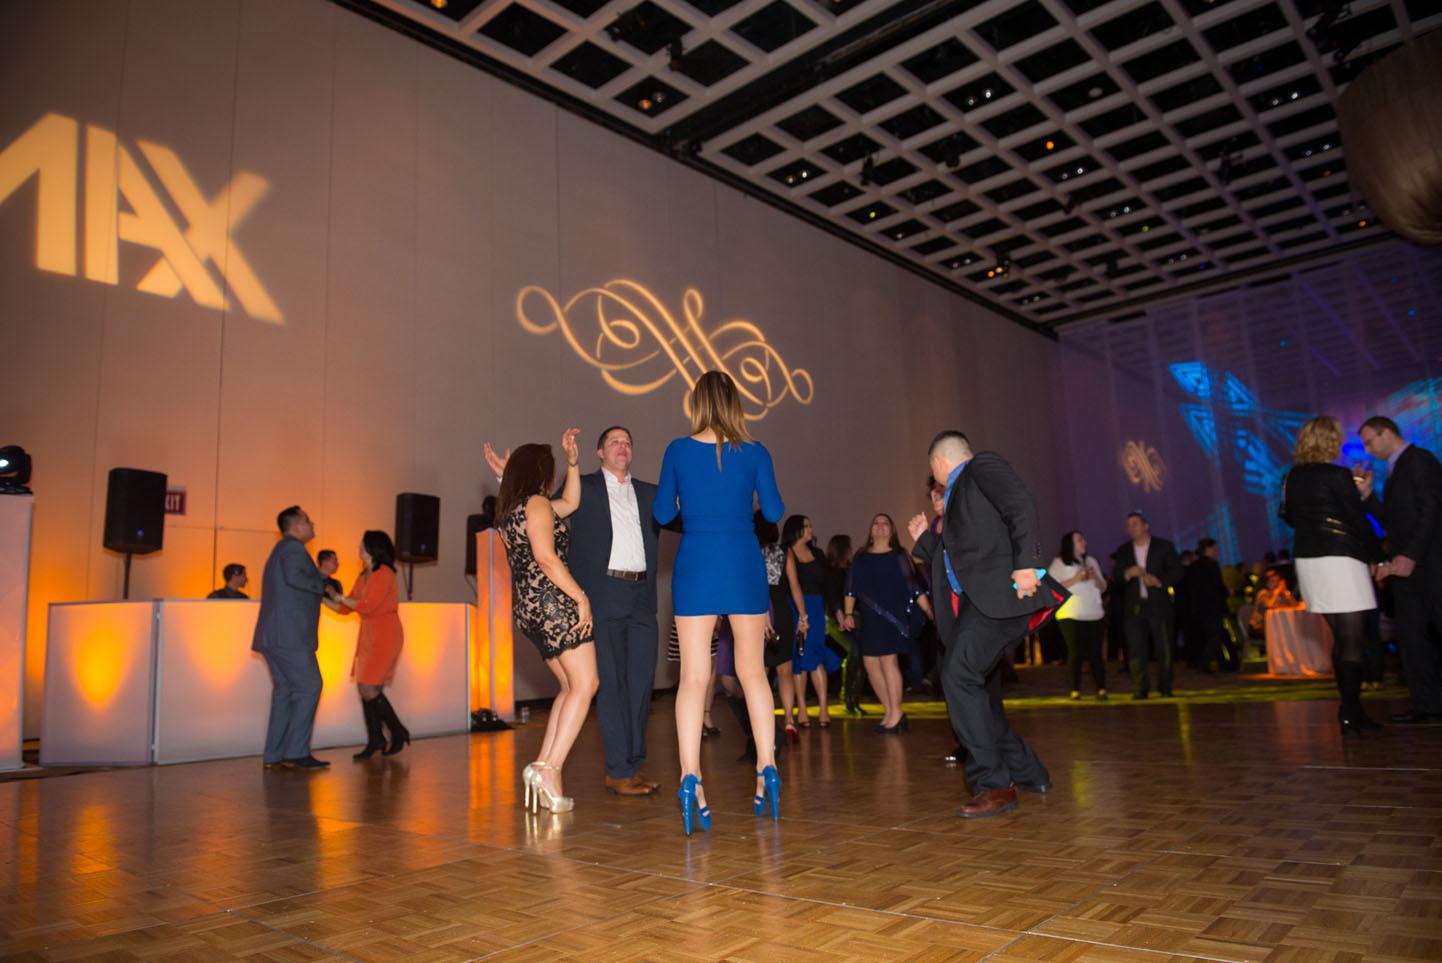 2015-12-09 ReMax Corpoarte Event - The Borgata - Atlantic City NJ - Photo Sesh - 2015-5150.jpg